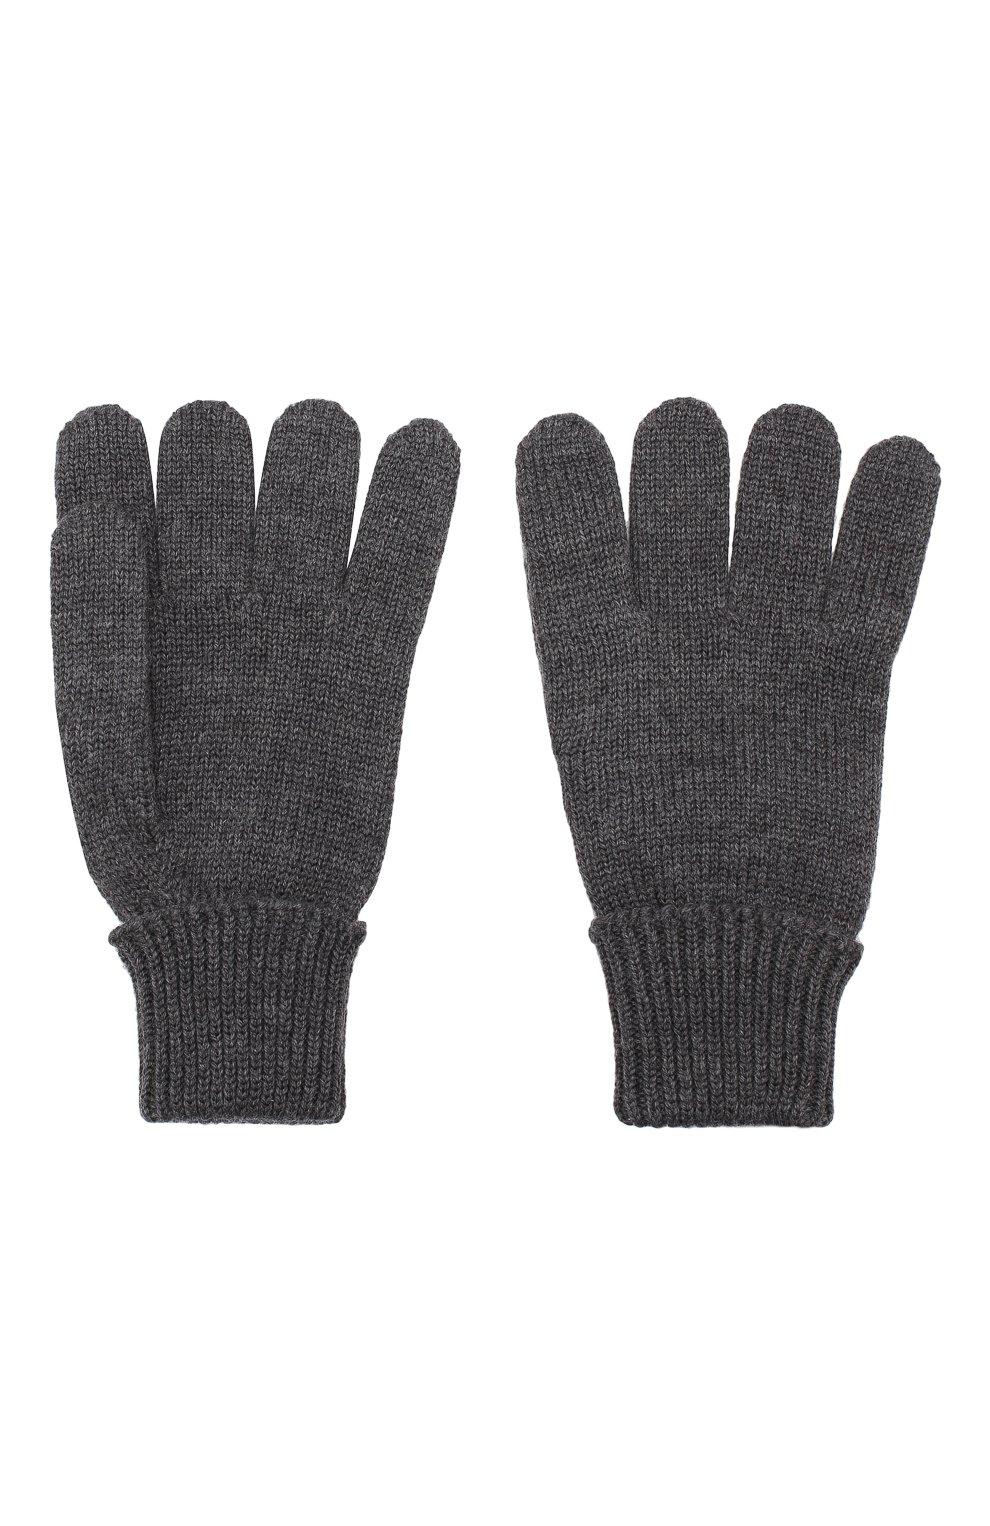 Детские шерстяные перчатки IL TRENINO темно-серого цвета, арт. 19 5059/E0 | Фото 2